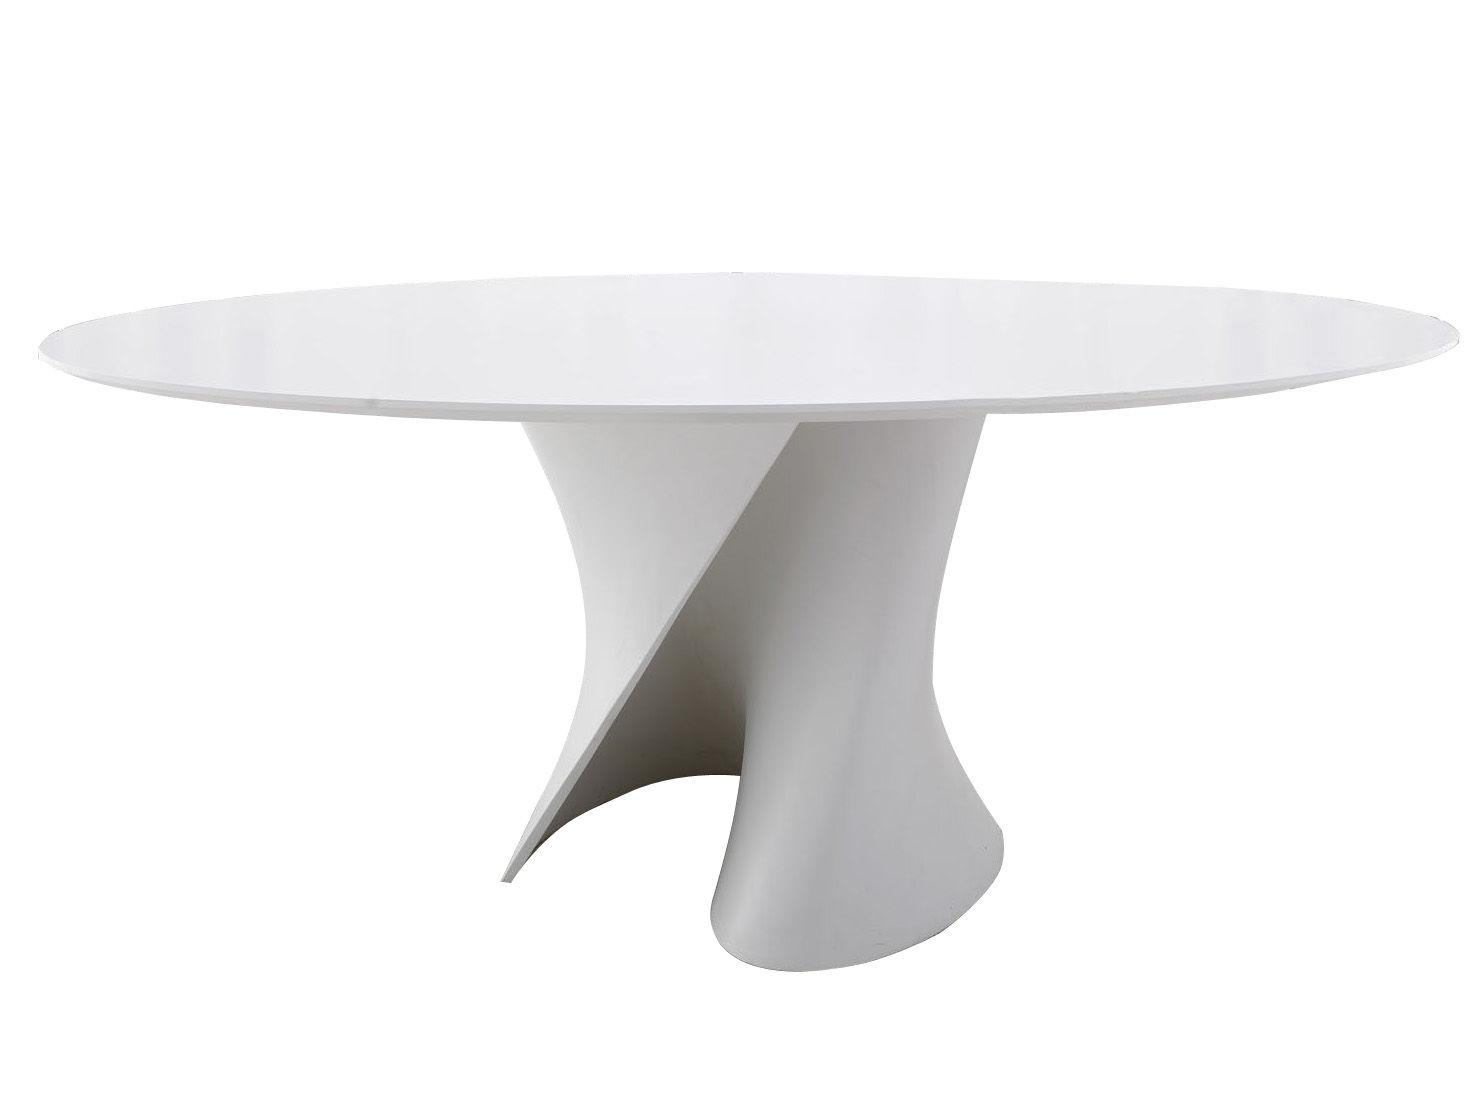 Mobilier - Tables - Table ronde S Ovale /150 x 210 cm - Plateau cristalplant - MDF Italia - Blanc - Cristalplant